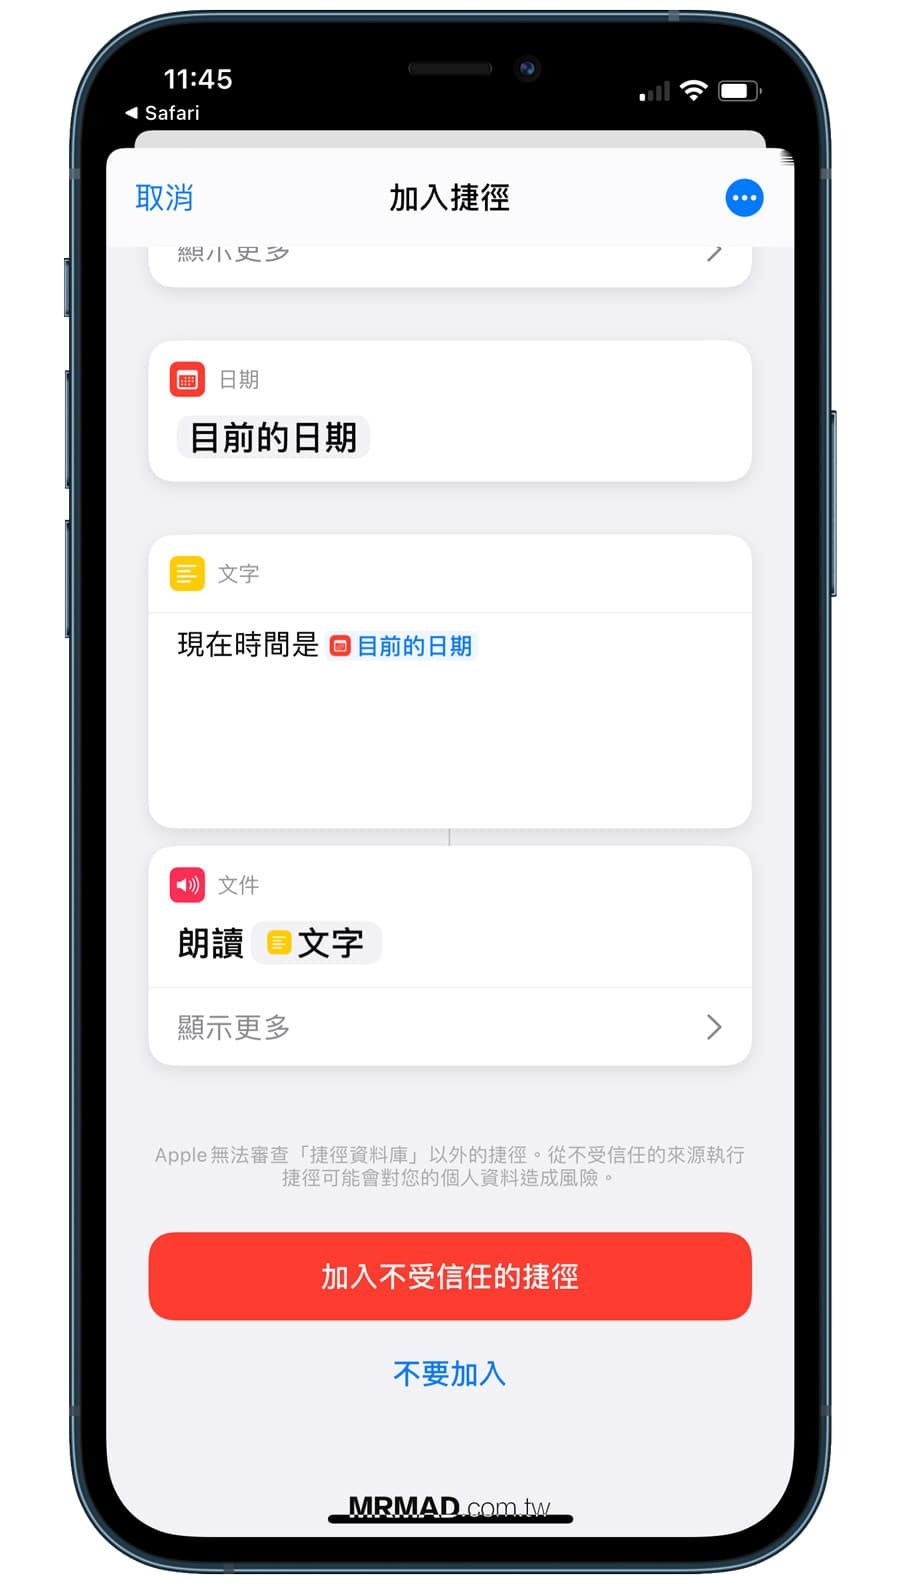 iPhone語音報時、整點報時如何設定?用捷徑自動化輕鬆實現